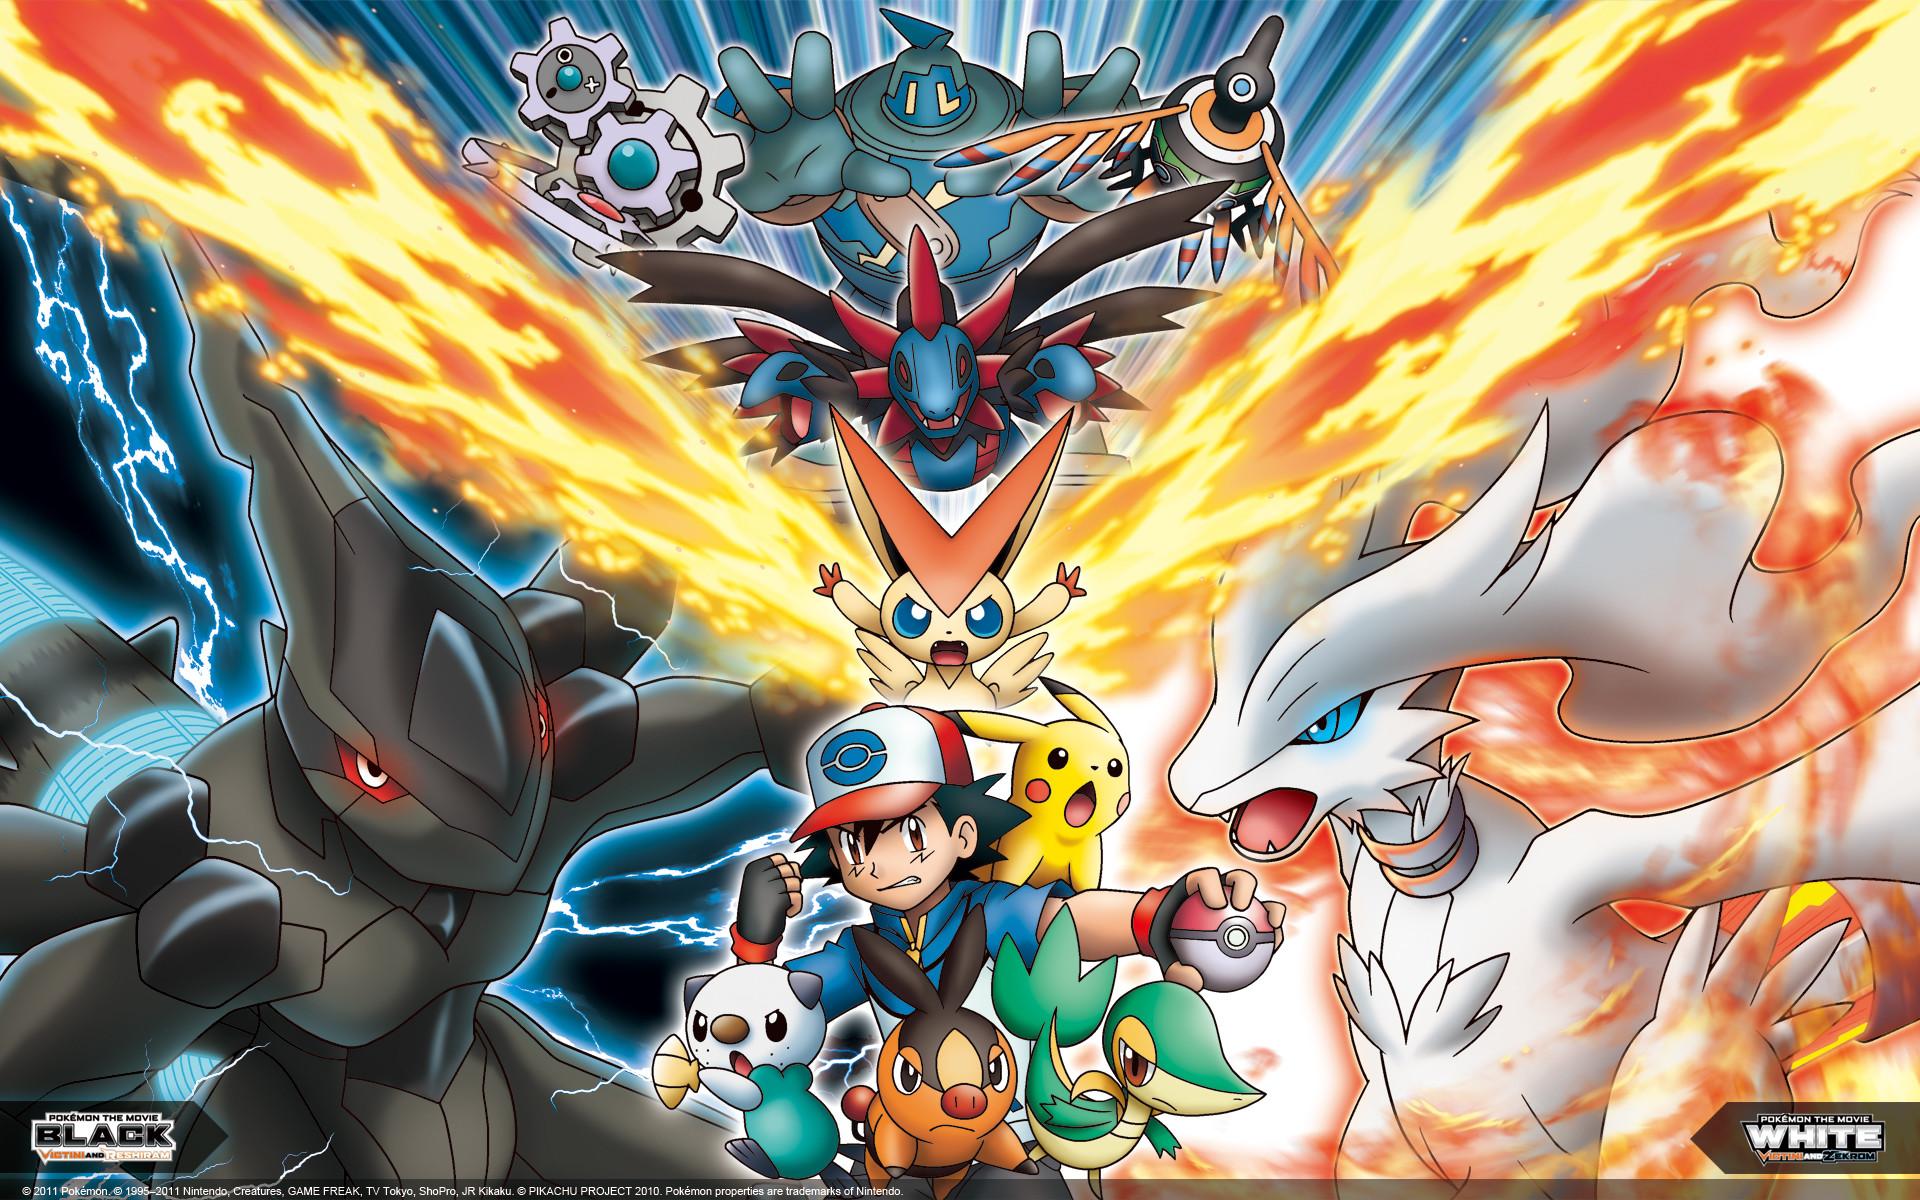 Pokémon the Movie: Victini Wallpaper